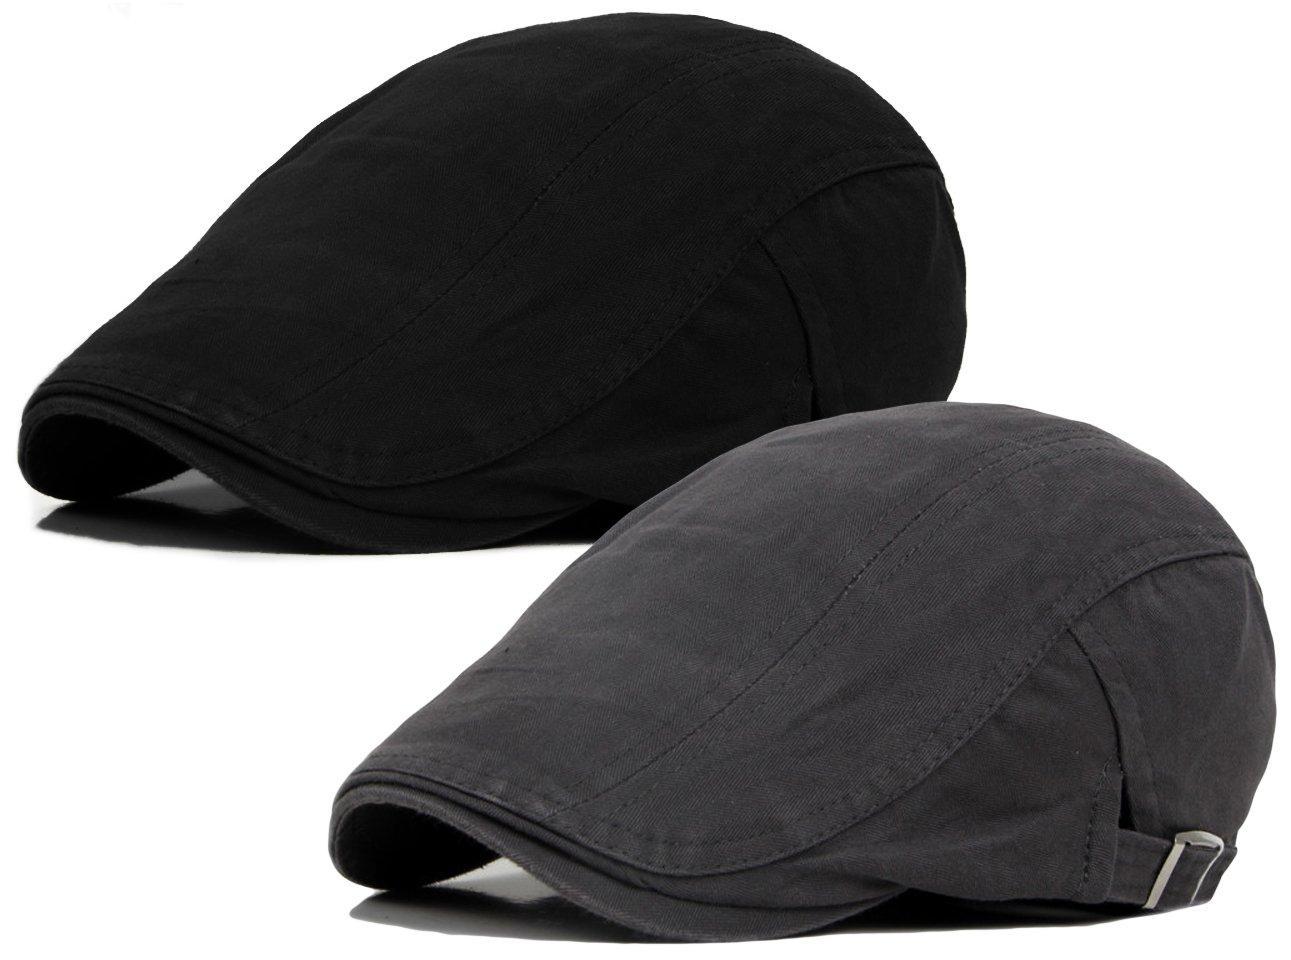 Qunson 2 Pack Men's Cotton Flat Ivy Gatsby Newsboy Driving Hat Cap